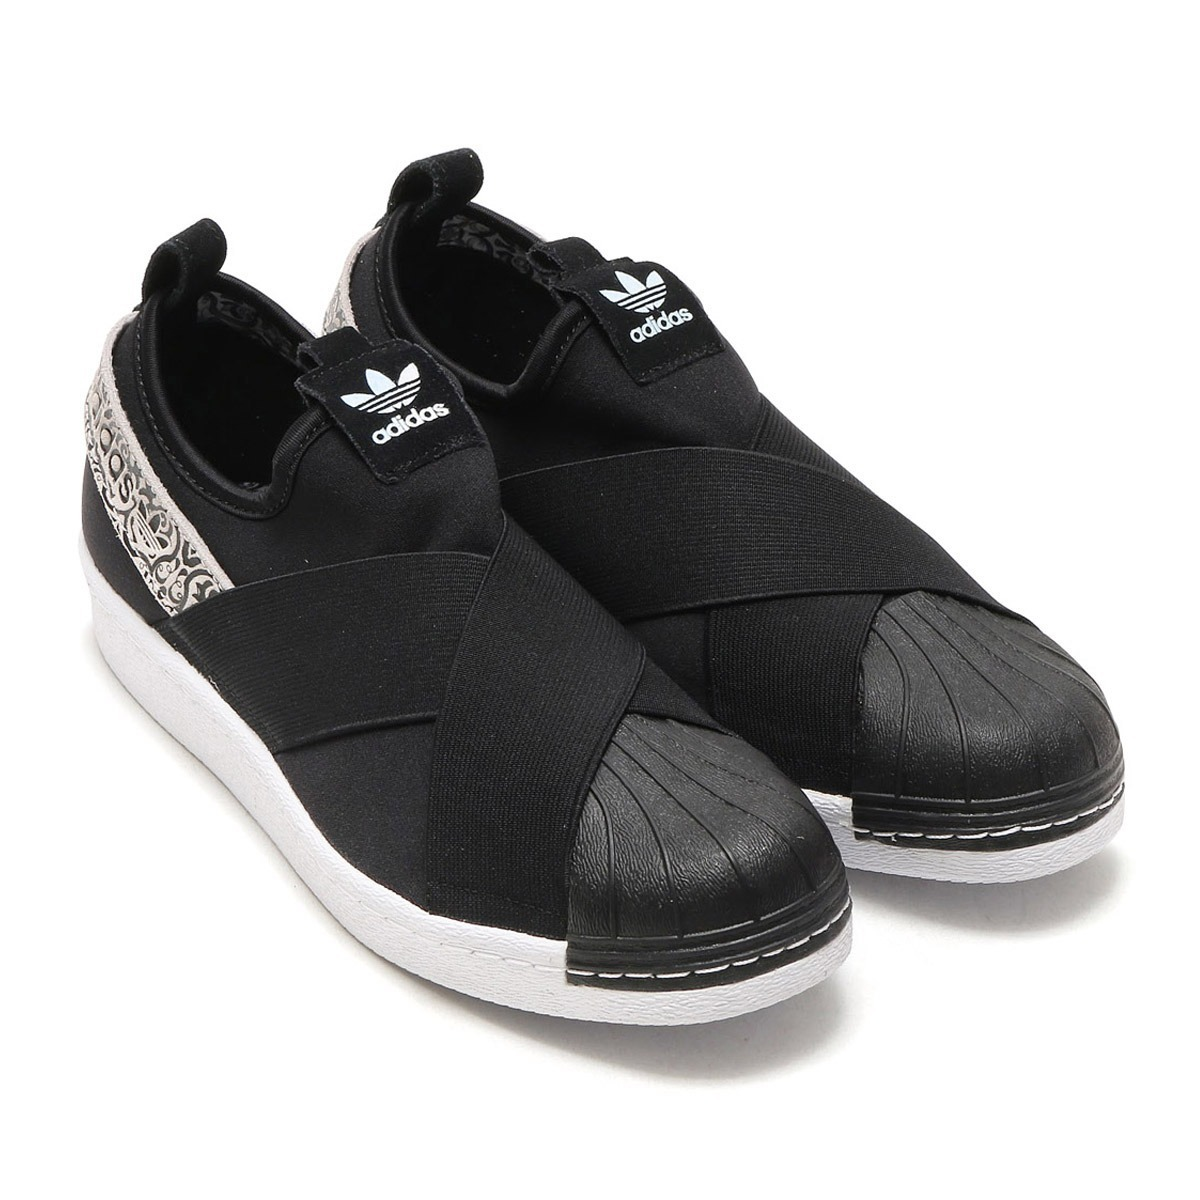 04691b1dd0f zapatillas adidas superstar slip on. Cargando zoom.